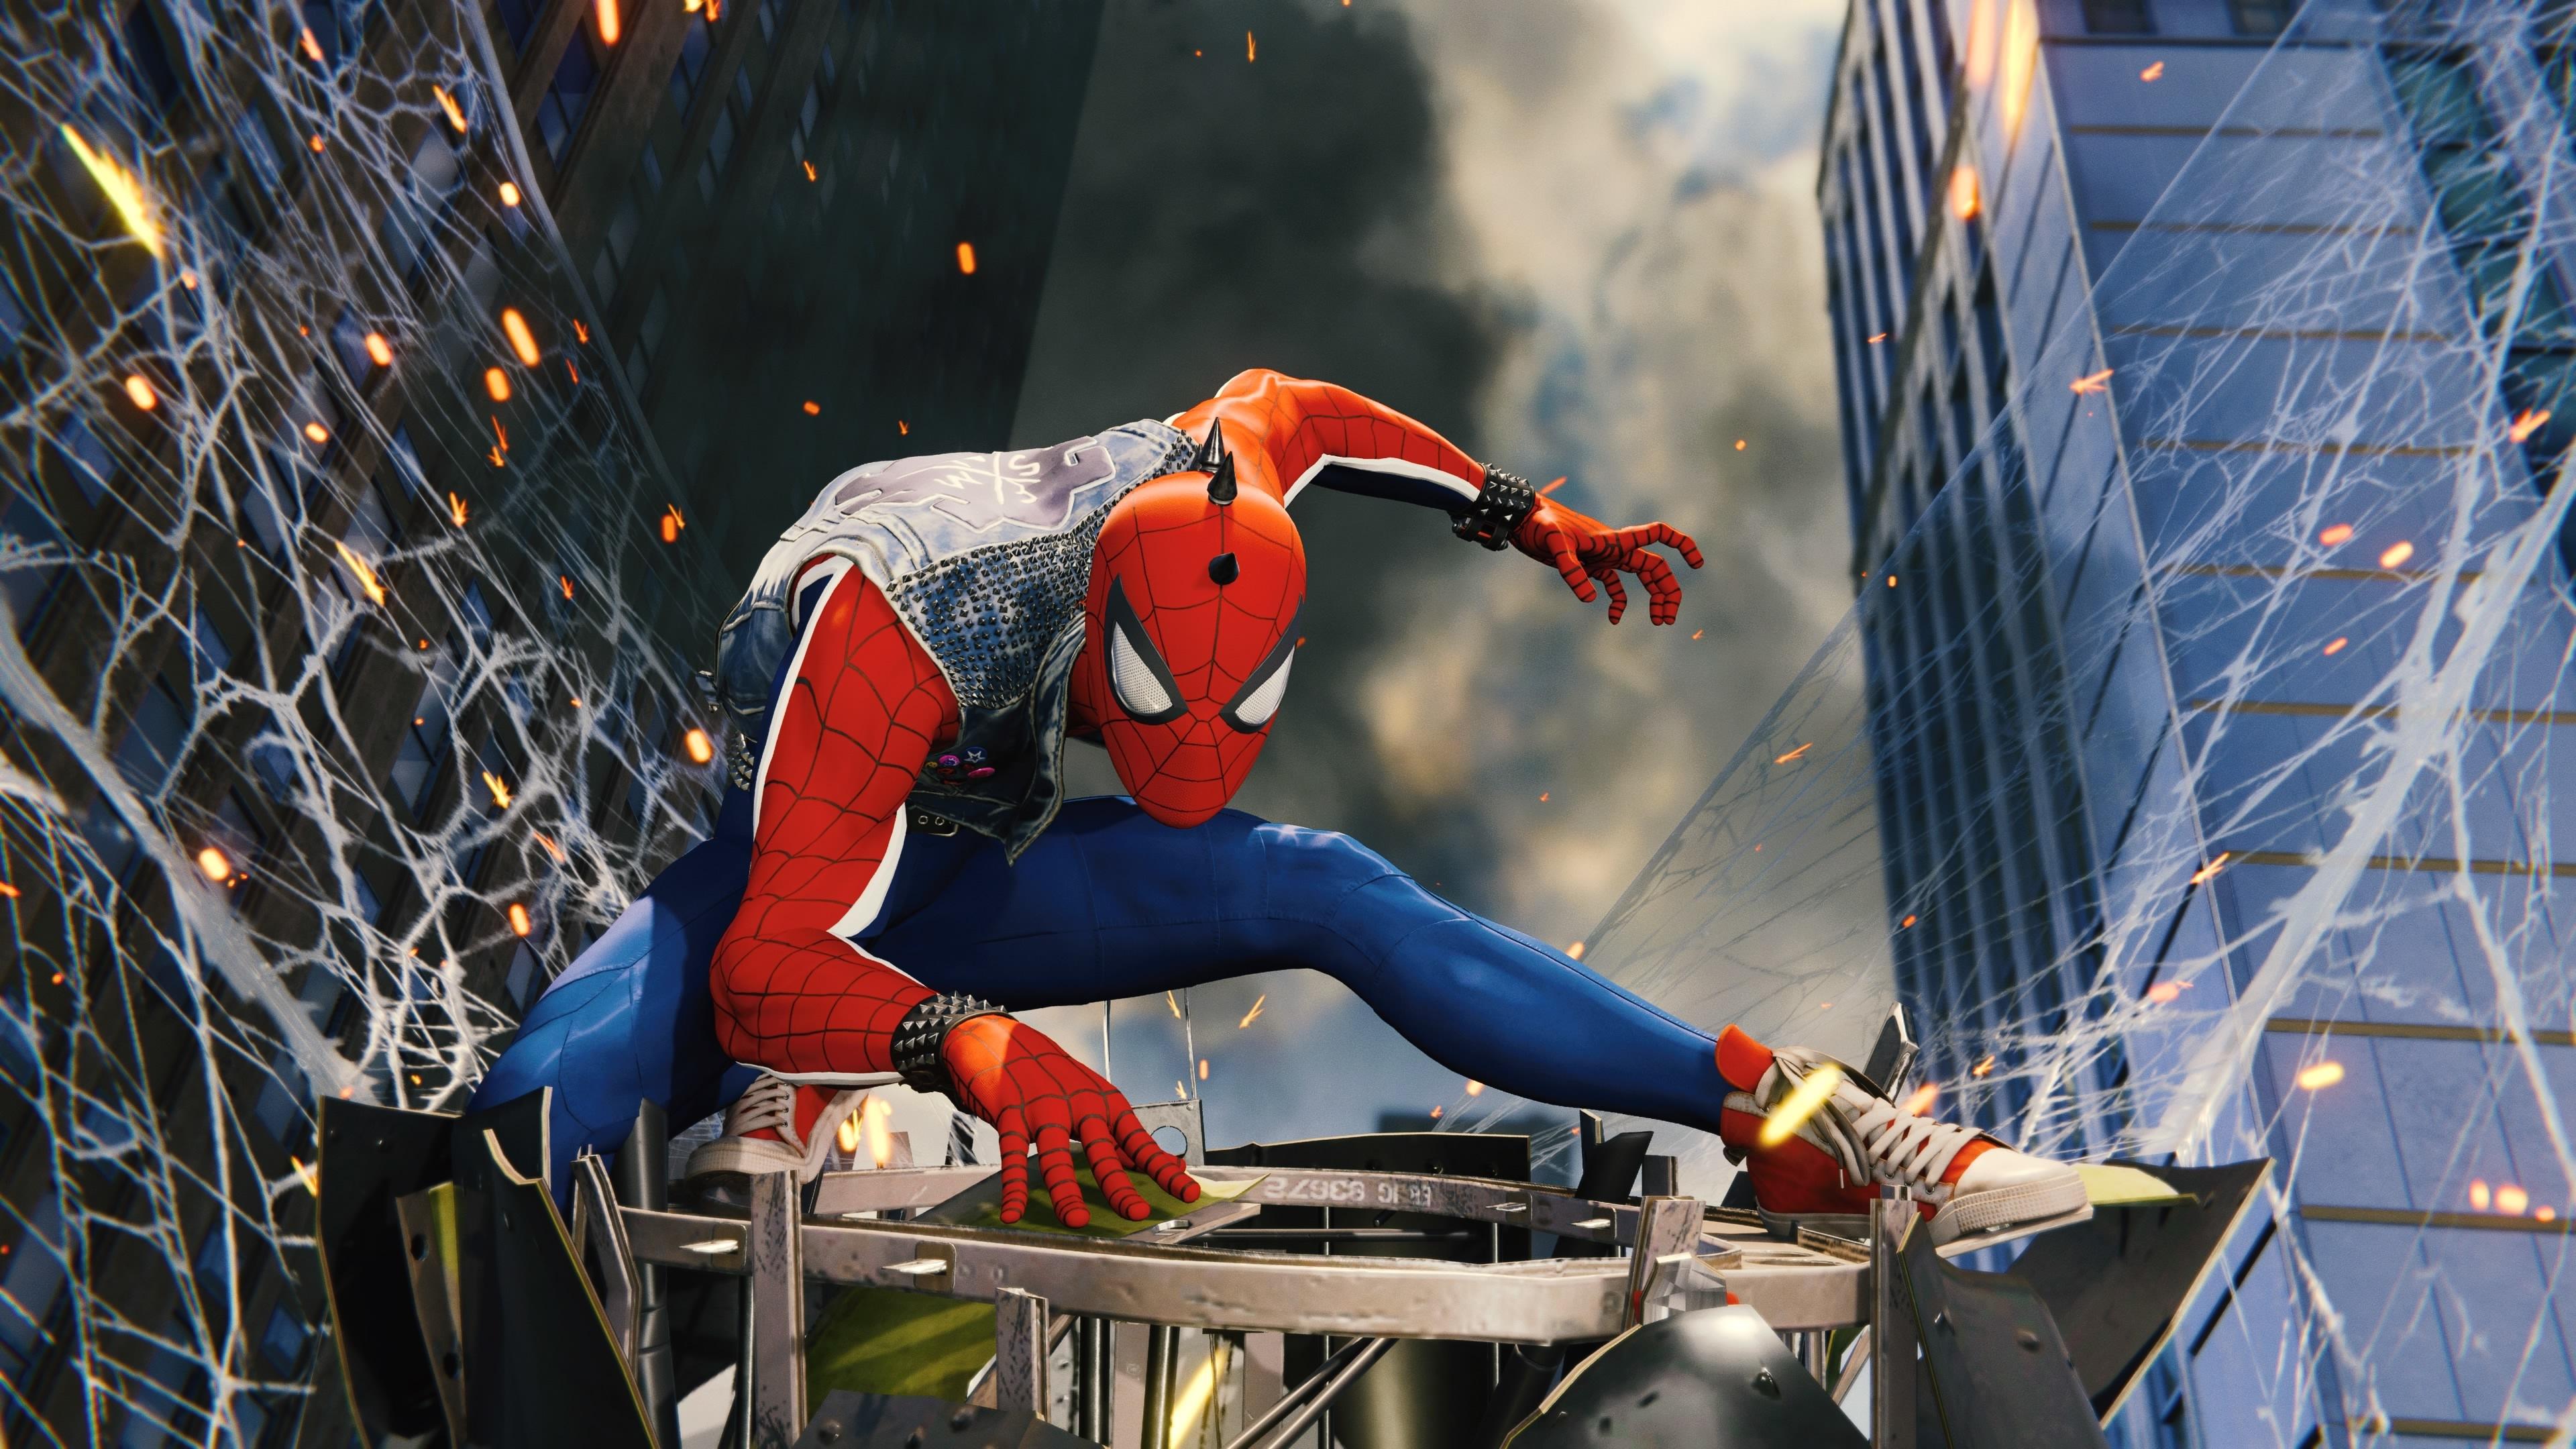 funky spiderman ps4 4k 1543619961 - Funky Spiderman Ps4 4k - superheroes wallpapers, spiderman ps4 wallpapers, ps games wallpapers, hd-wallpapers, games wallpapers, 4k-wallpapers, 2018 games wallpapers